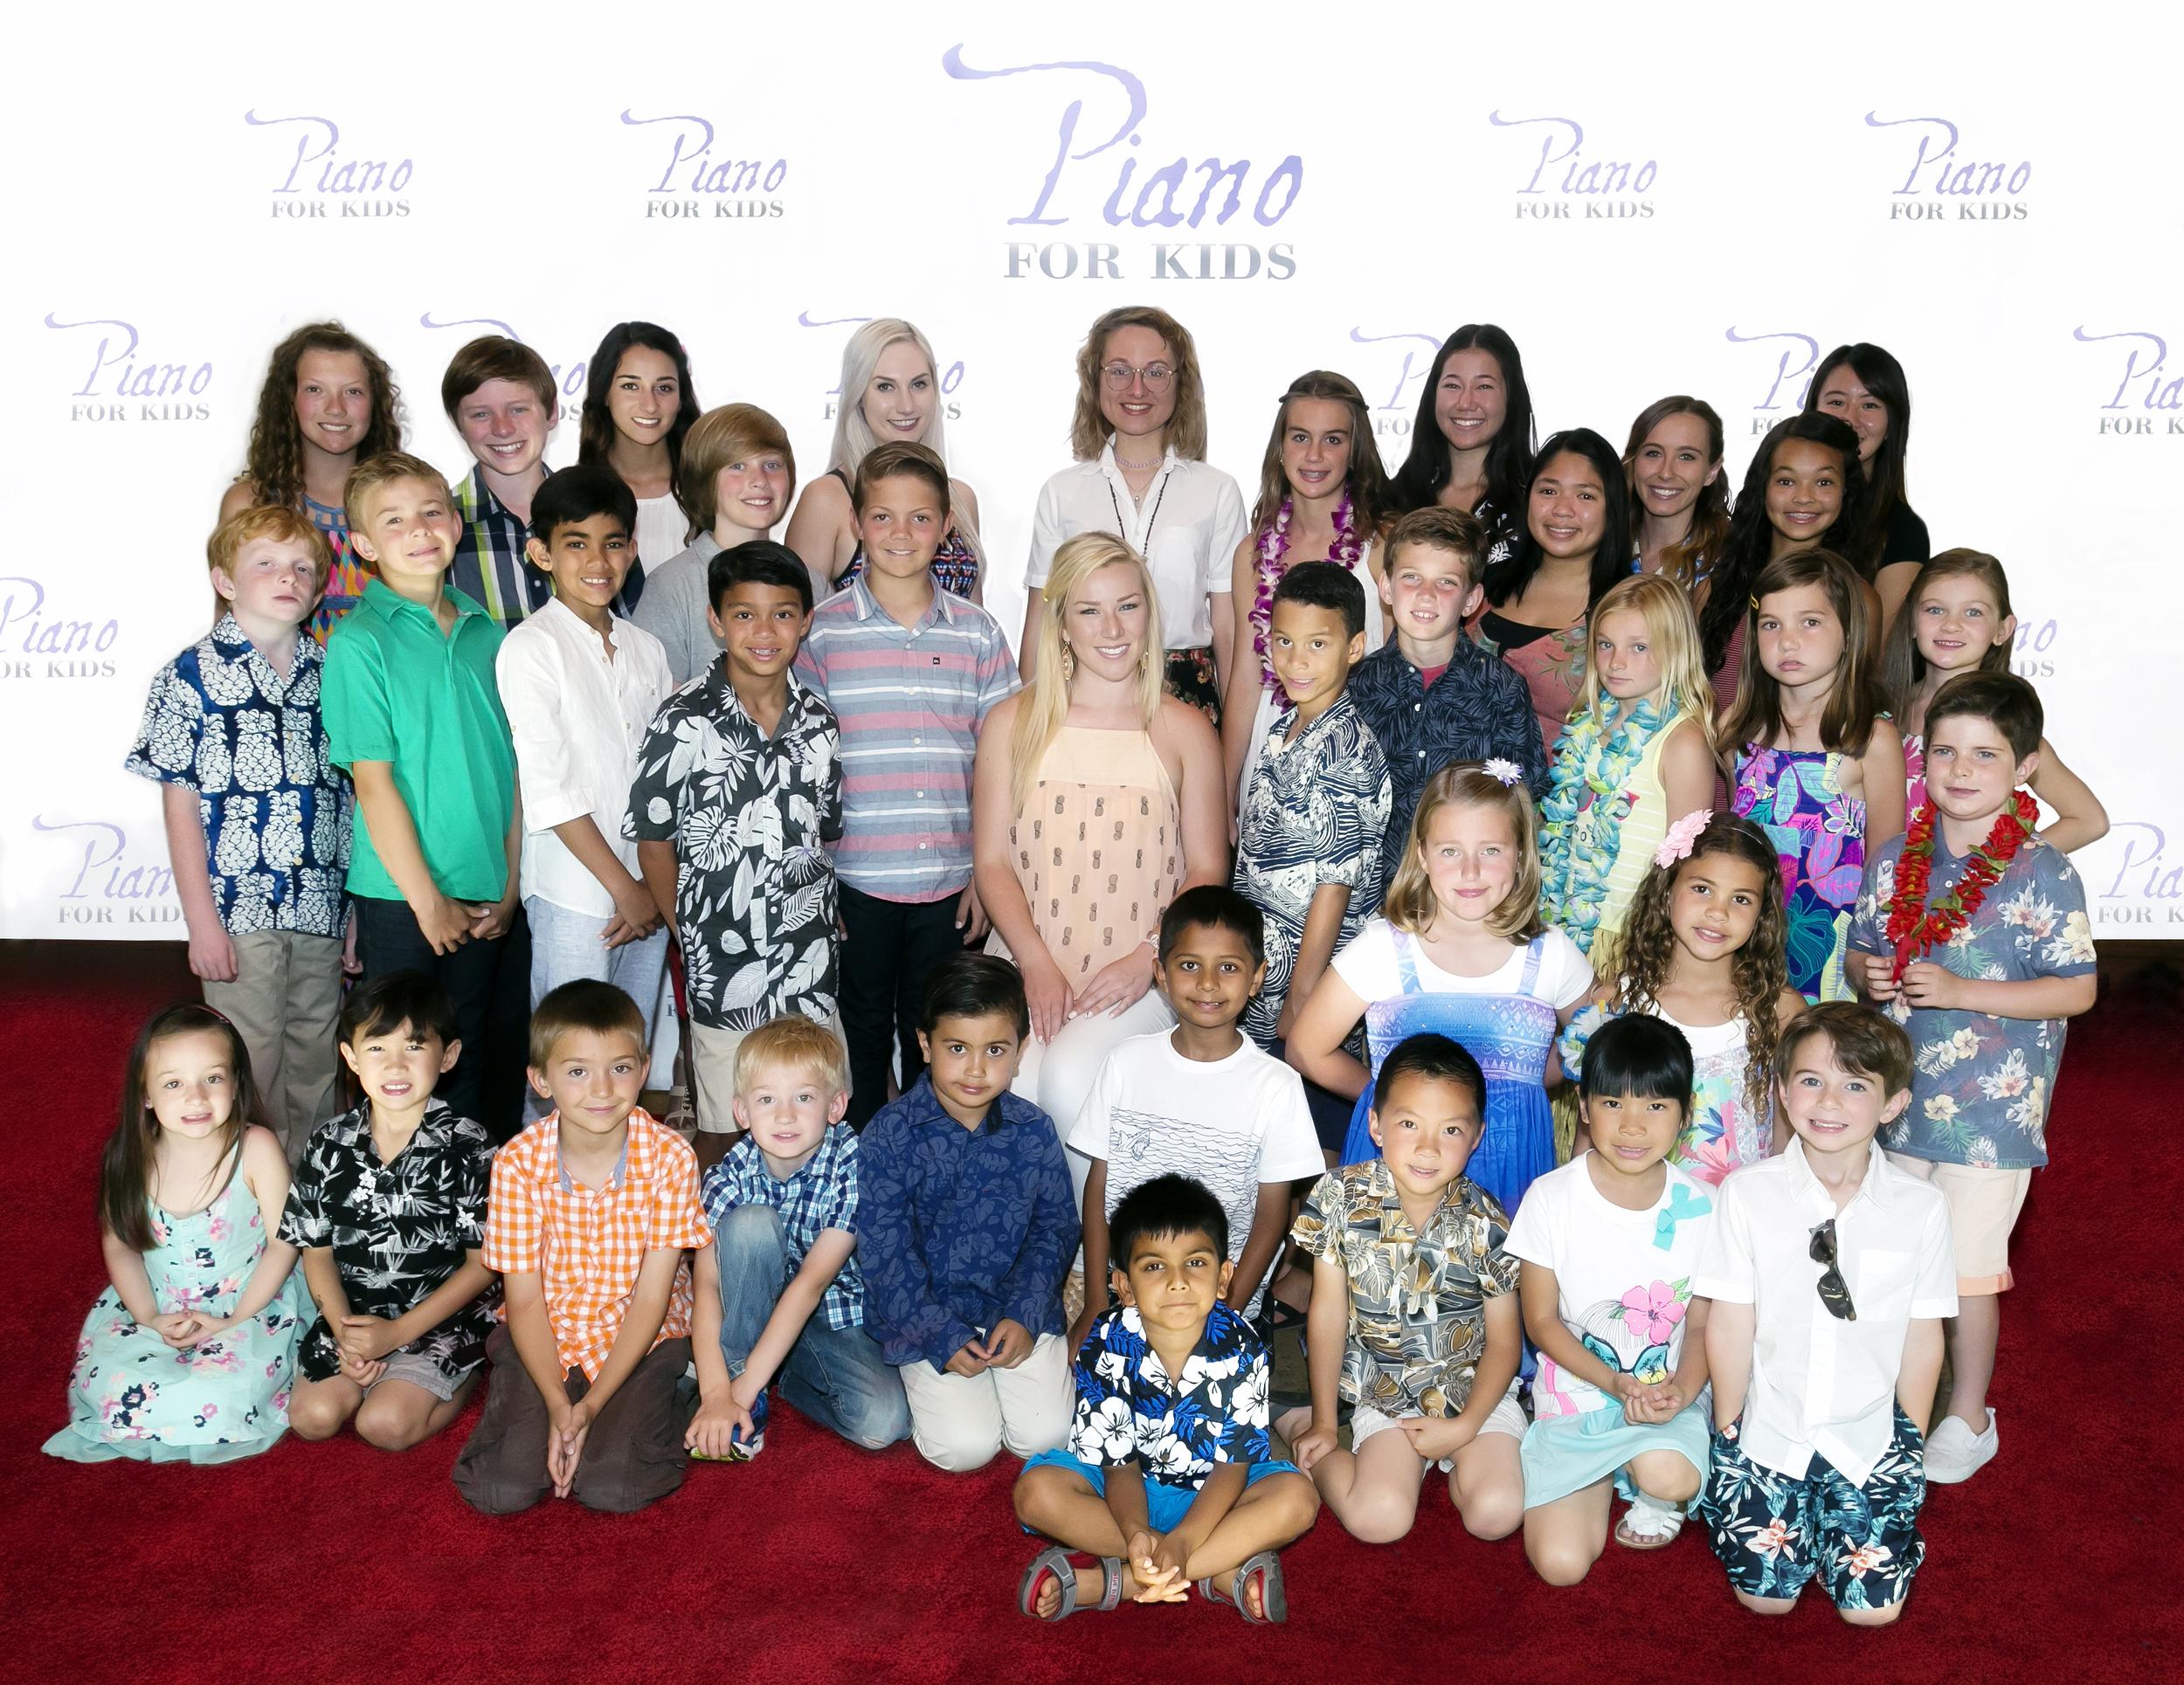 Summer Recital Group Photo.jpg